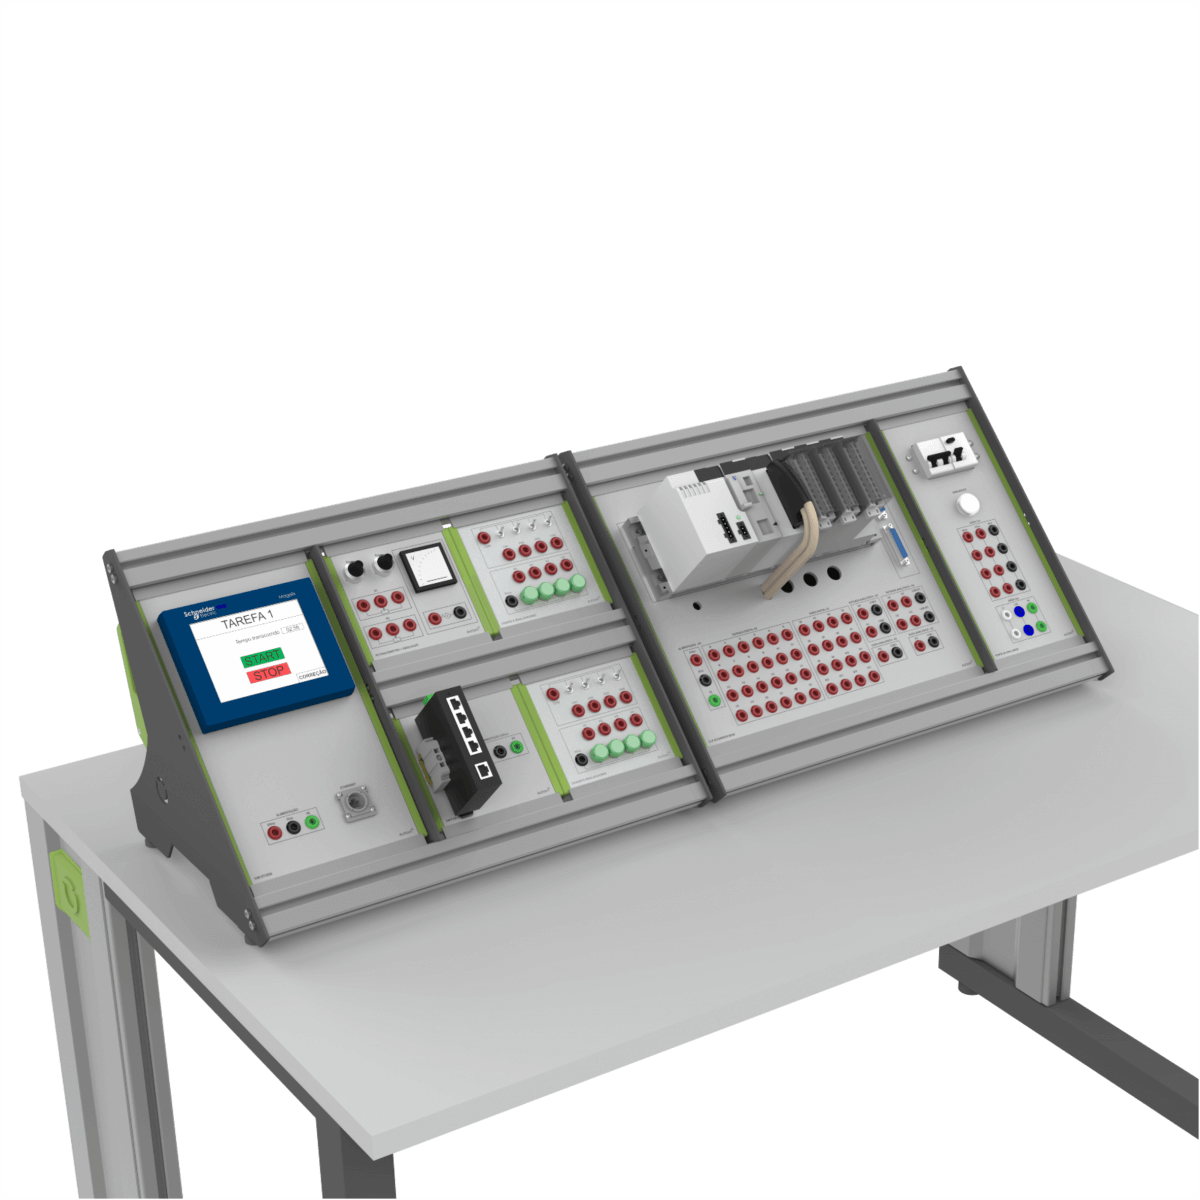 lab-automacao-bancada-didatica-rack-desktop-m340-auttom-3